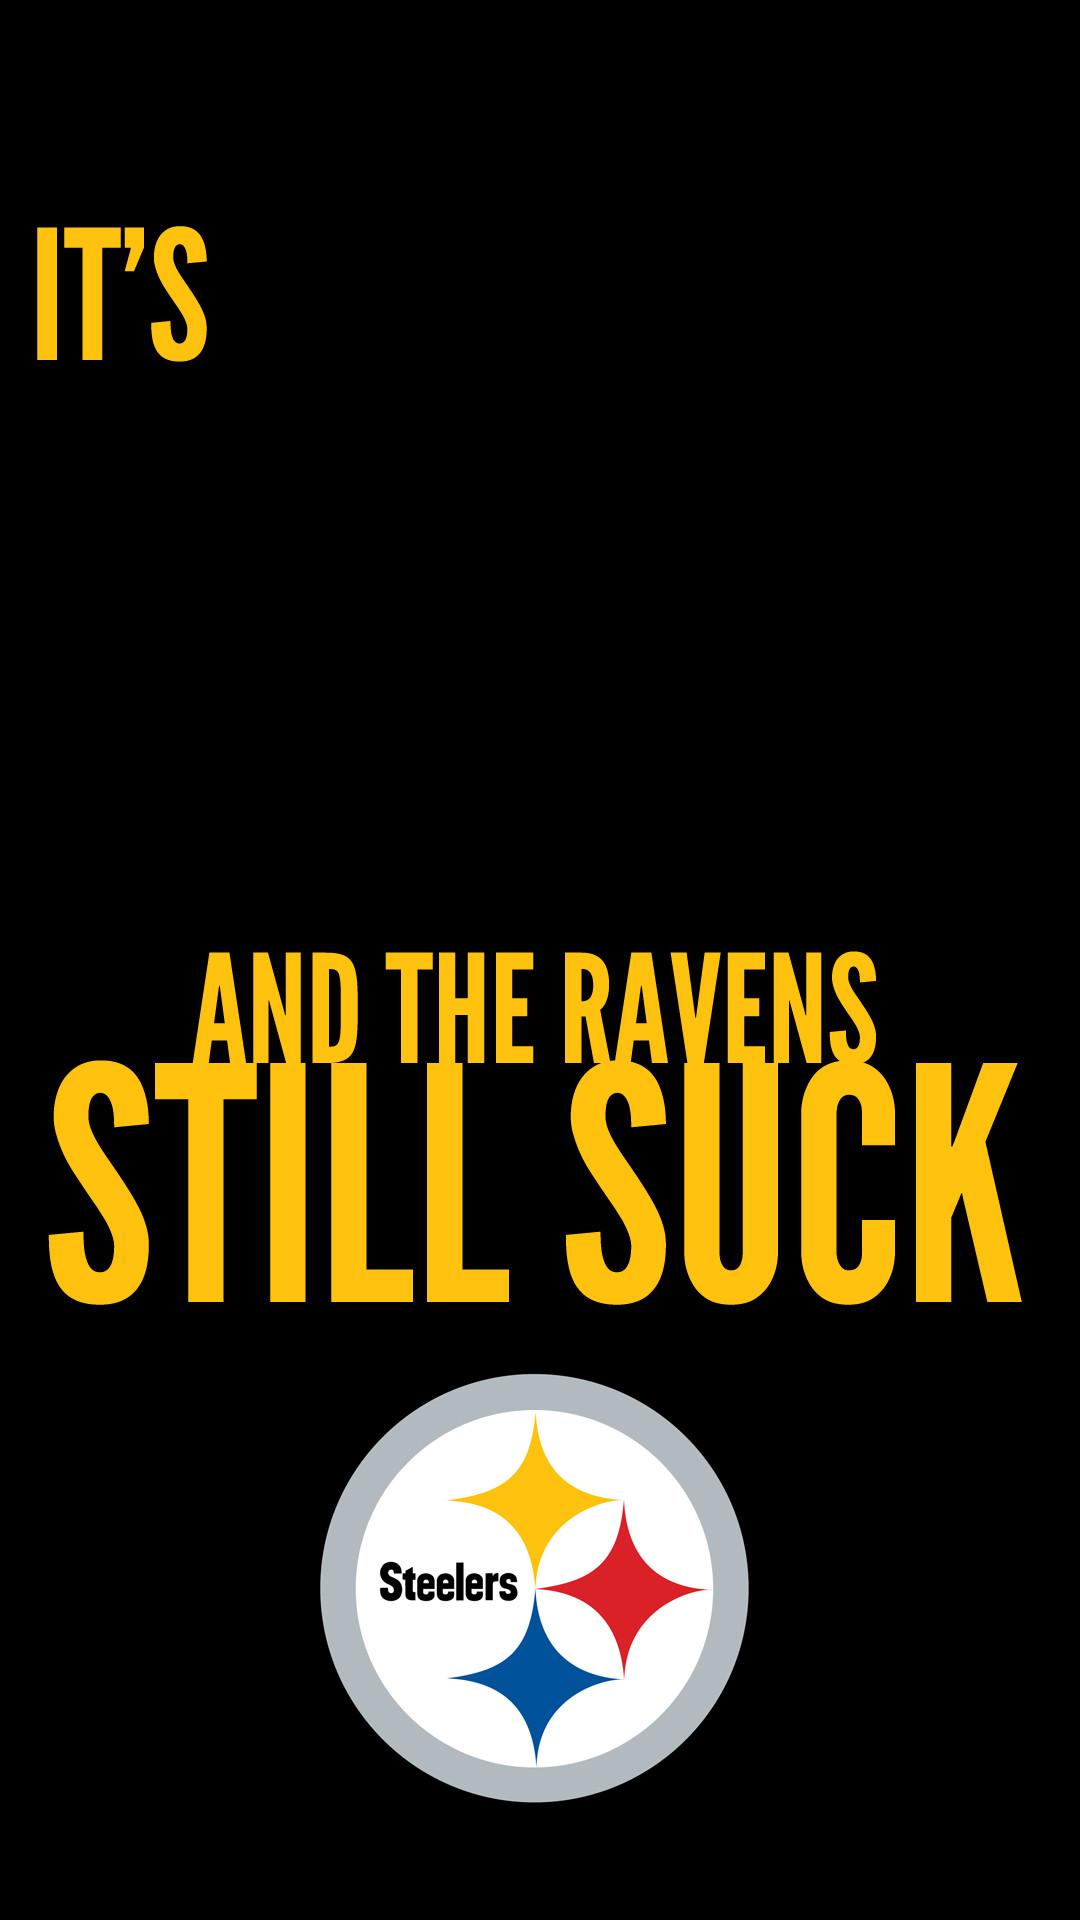 Steelers iPhone 6+ (1920×1080) Black Background